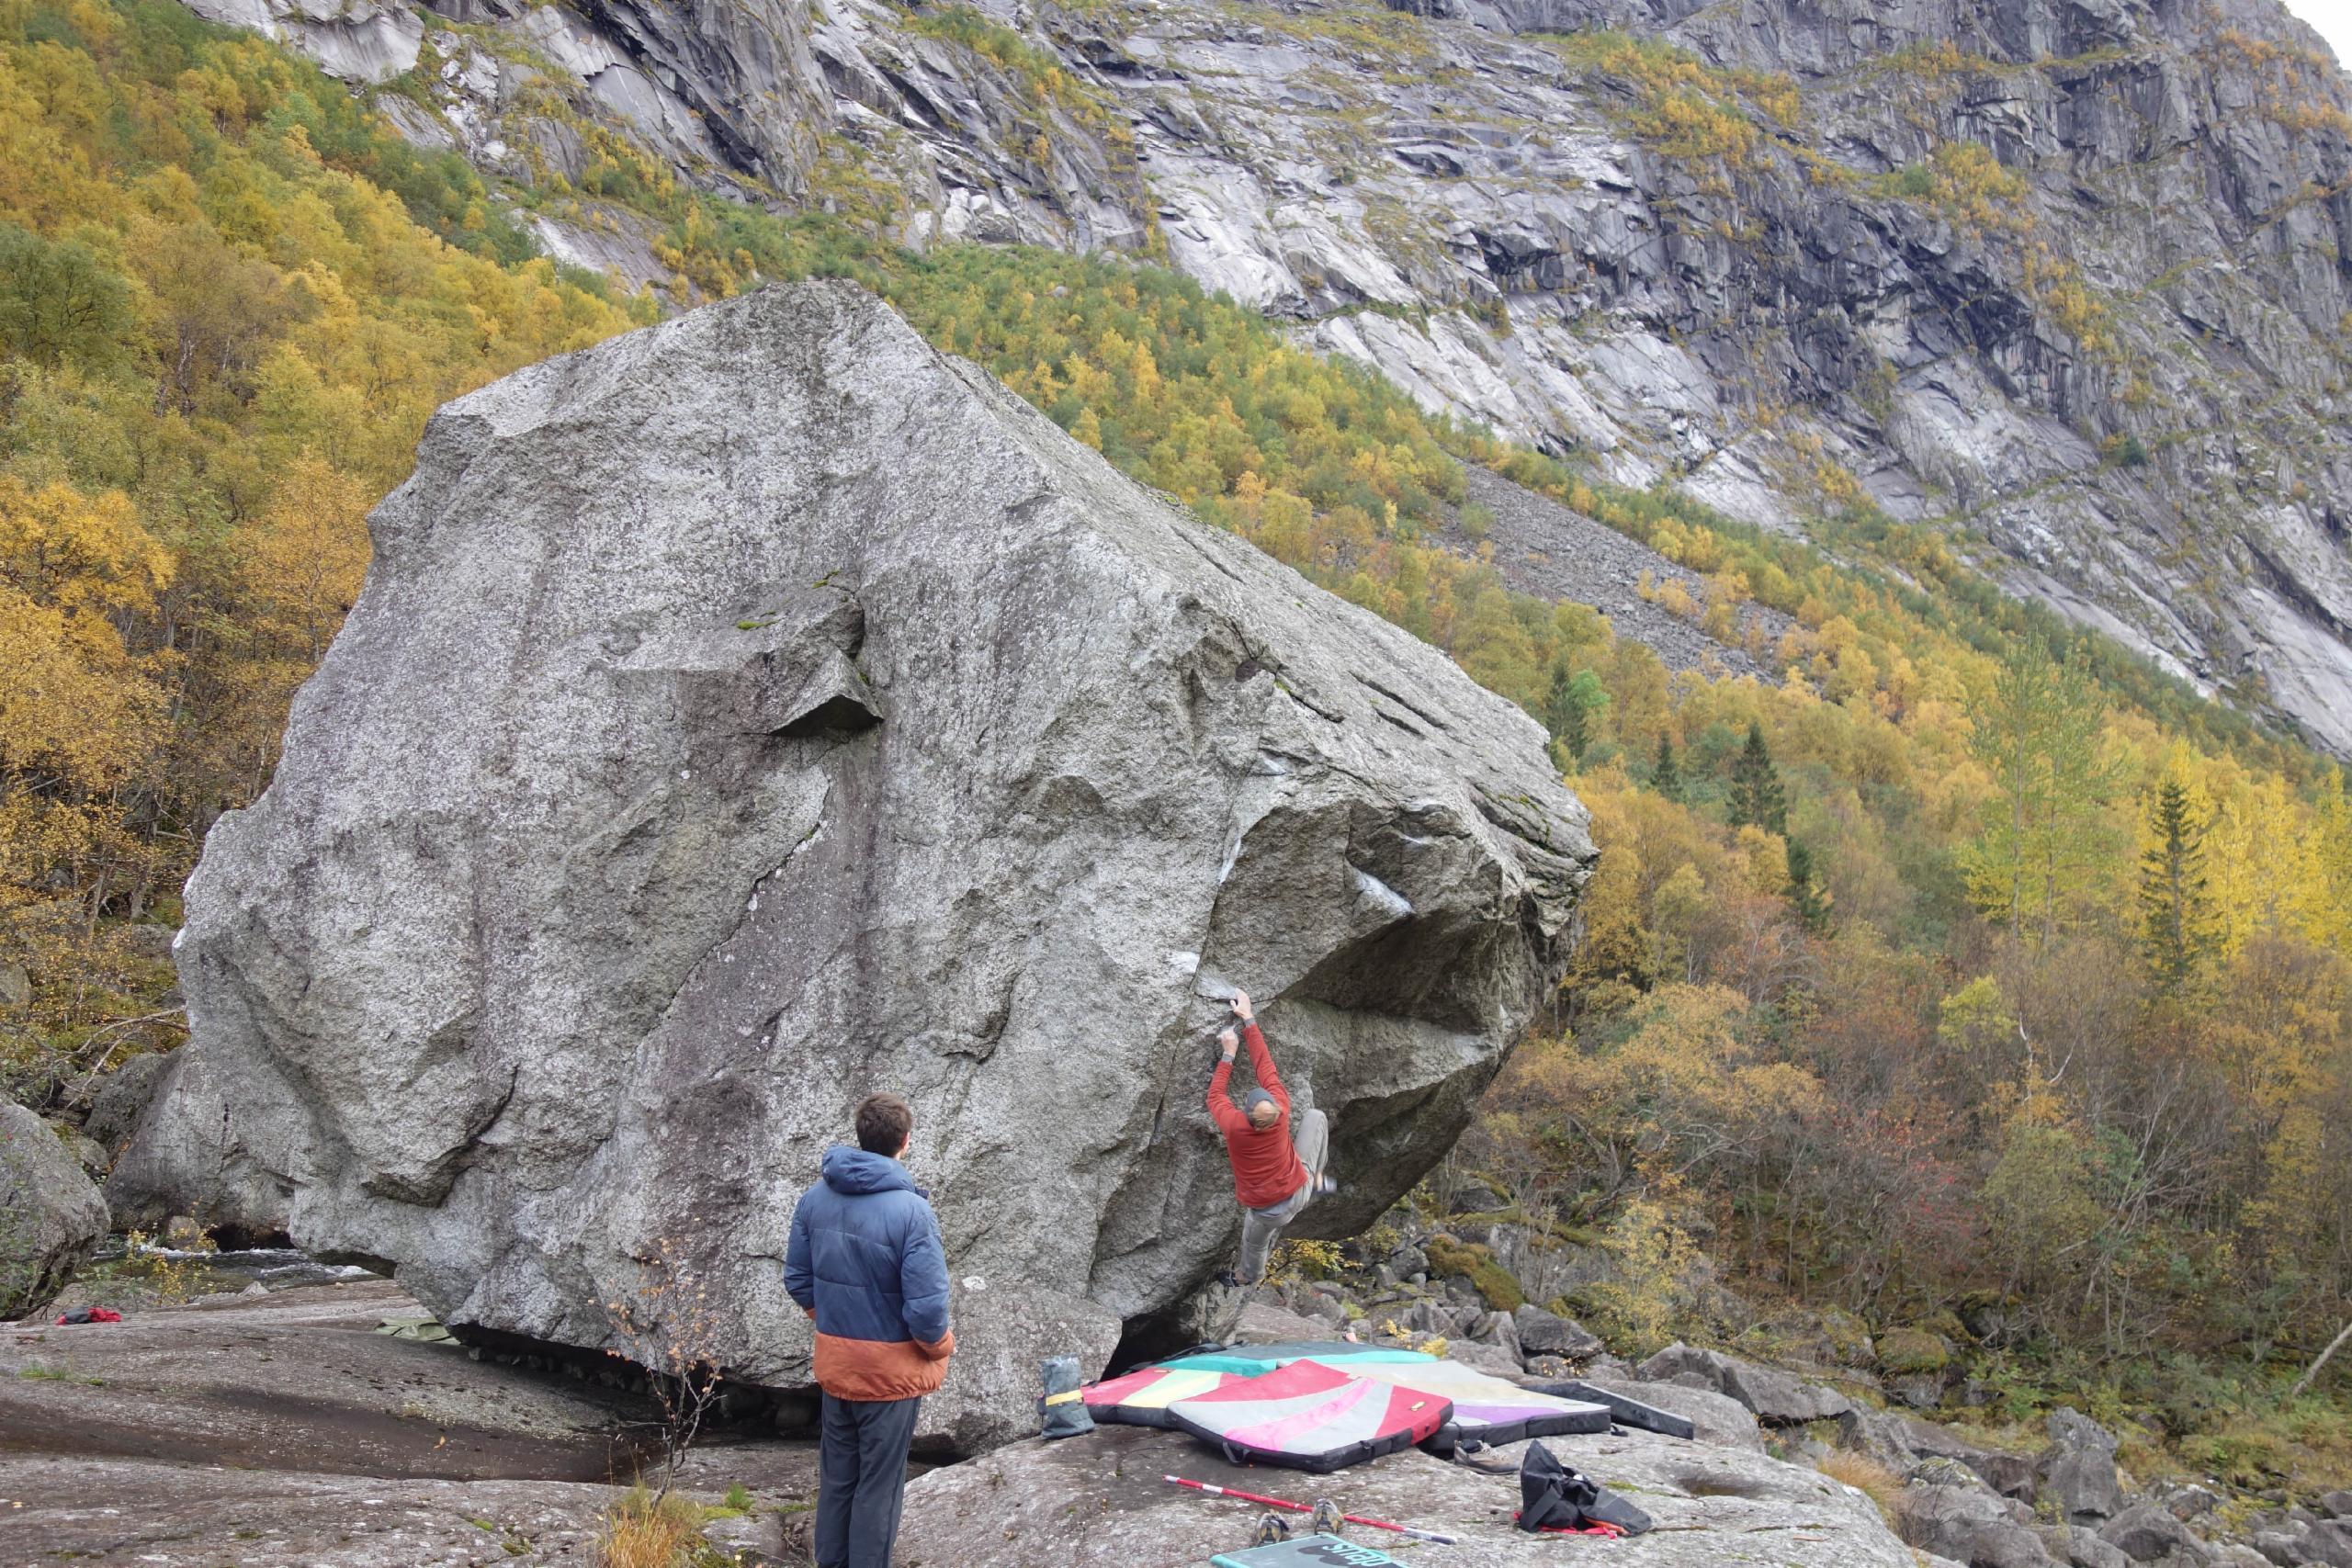 photographer: Jostein Øygarden, in photo: Stian Christopher Viken